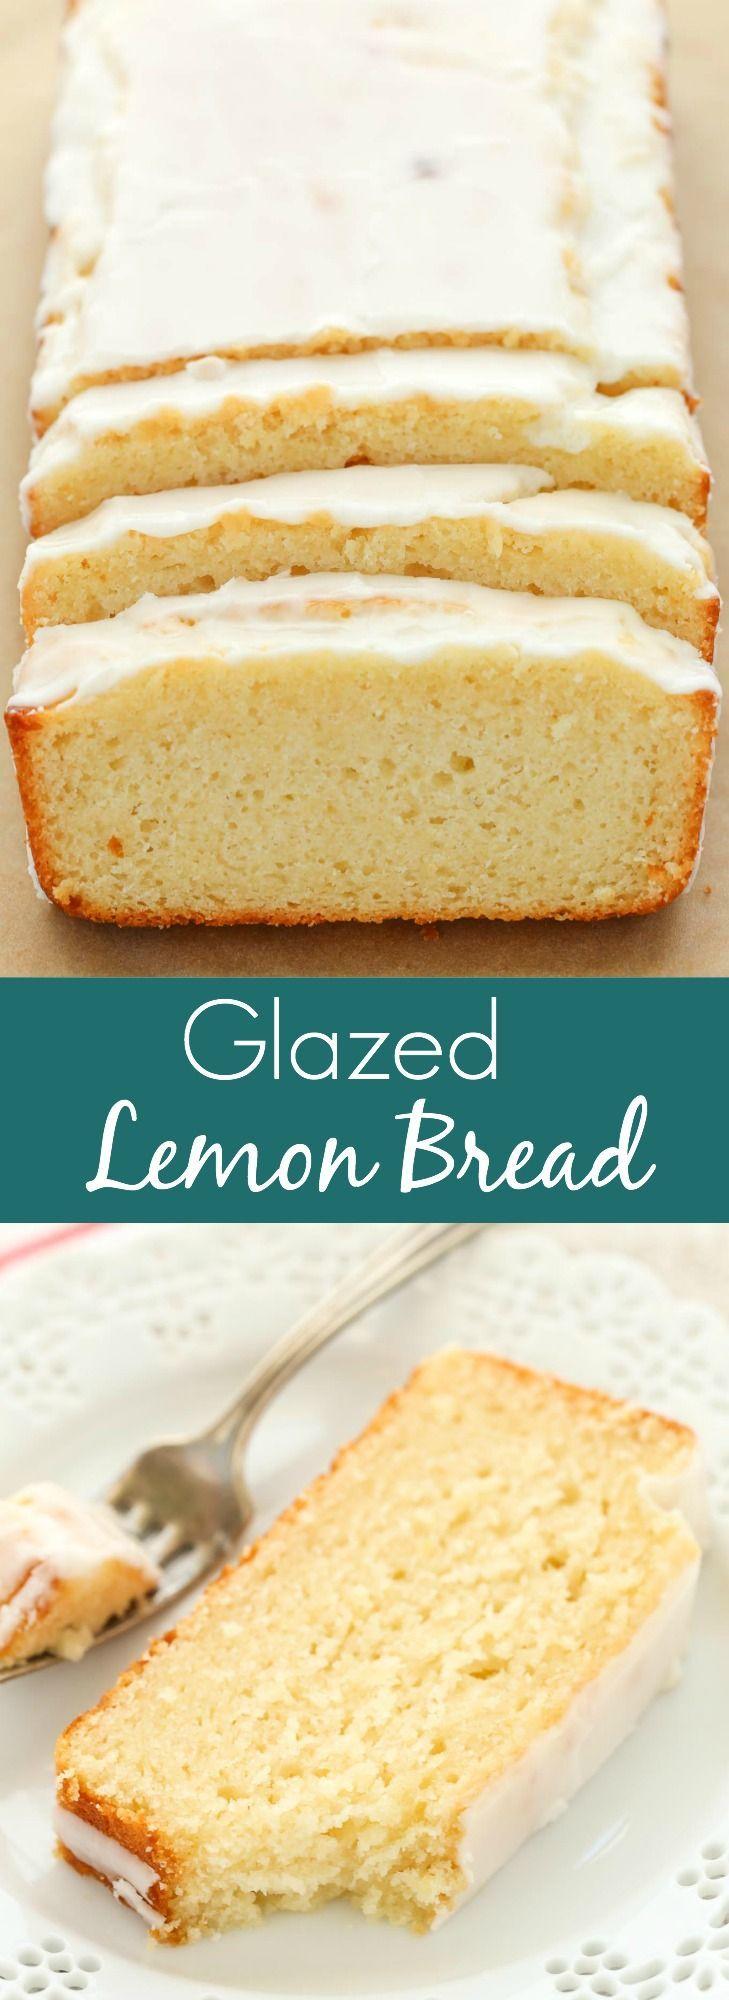 An easy lemon bread recipe topped with a sweet lemon glaze. This Glazed Lemon Bread is perfect for breakfast, brunch, or dessert!